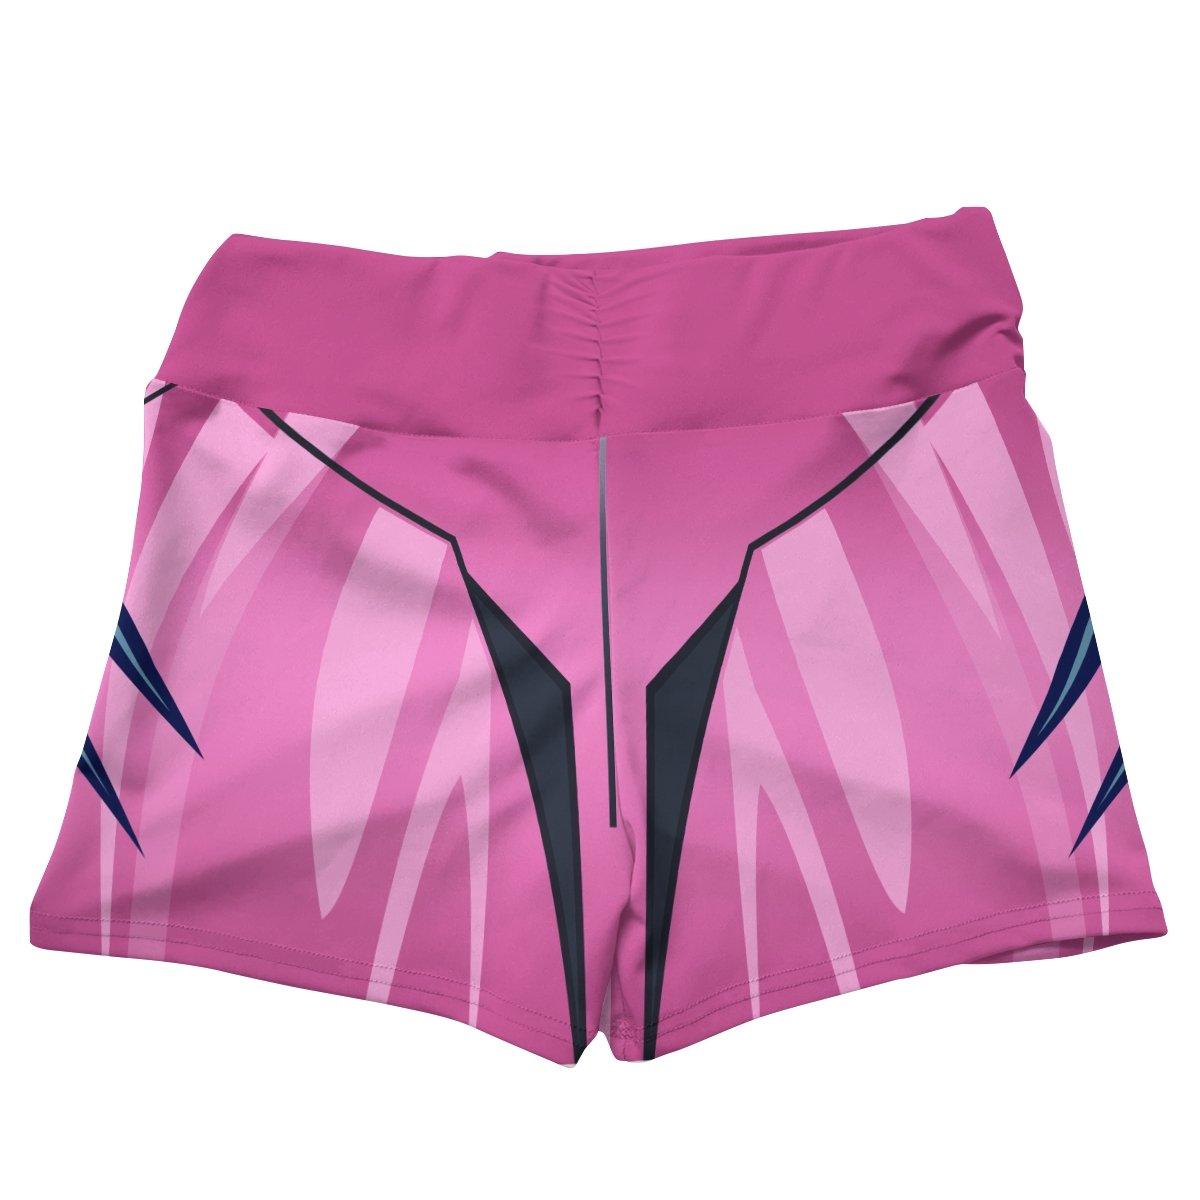 neon genesis mari active wear set 190562 - Anime Swimsuits